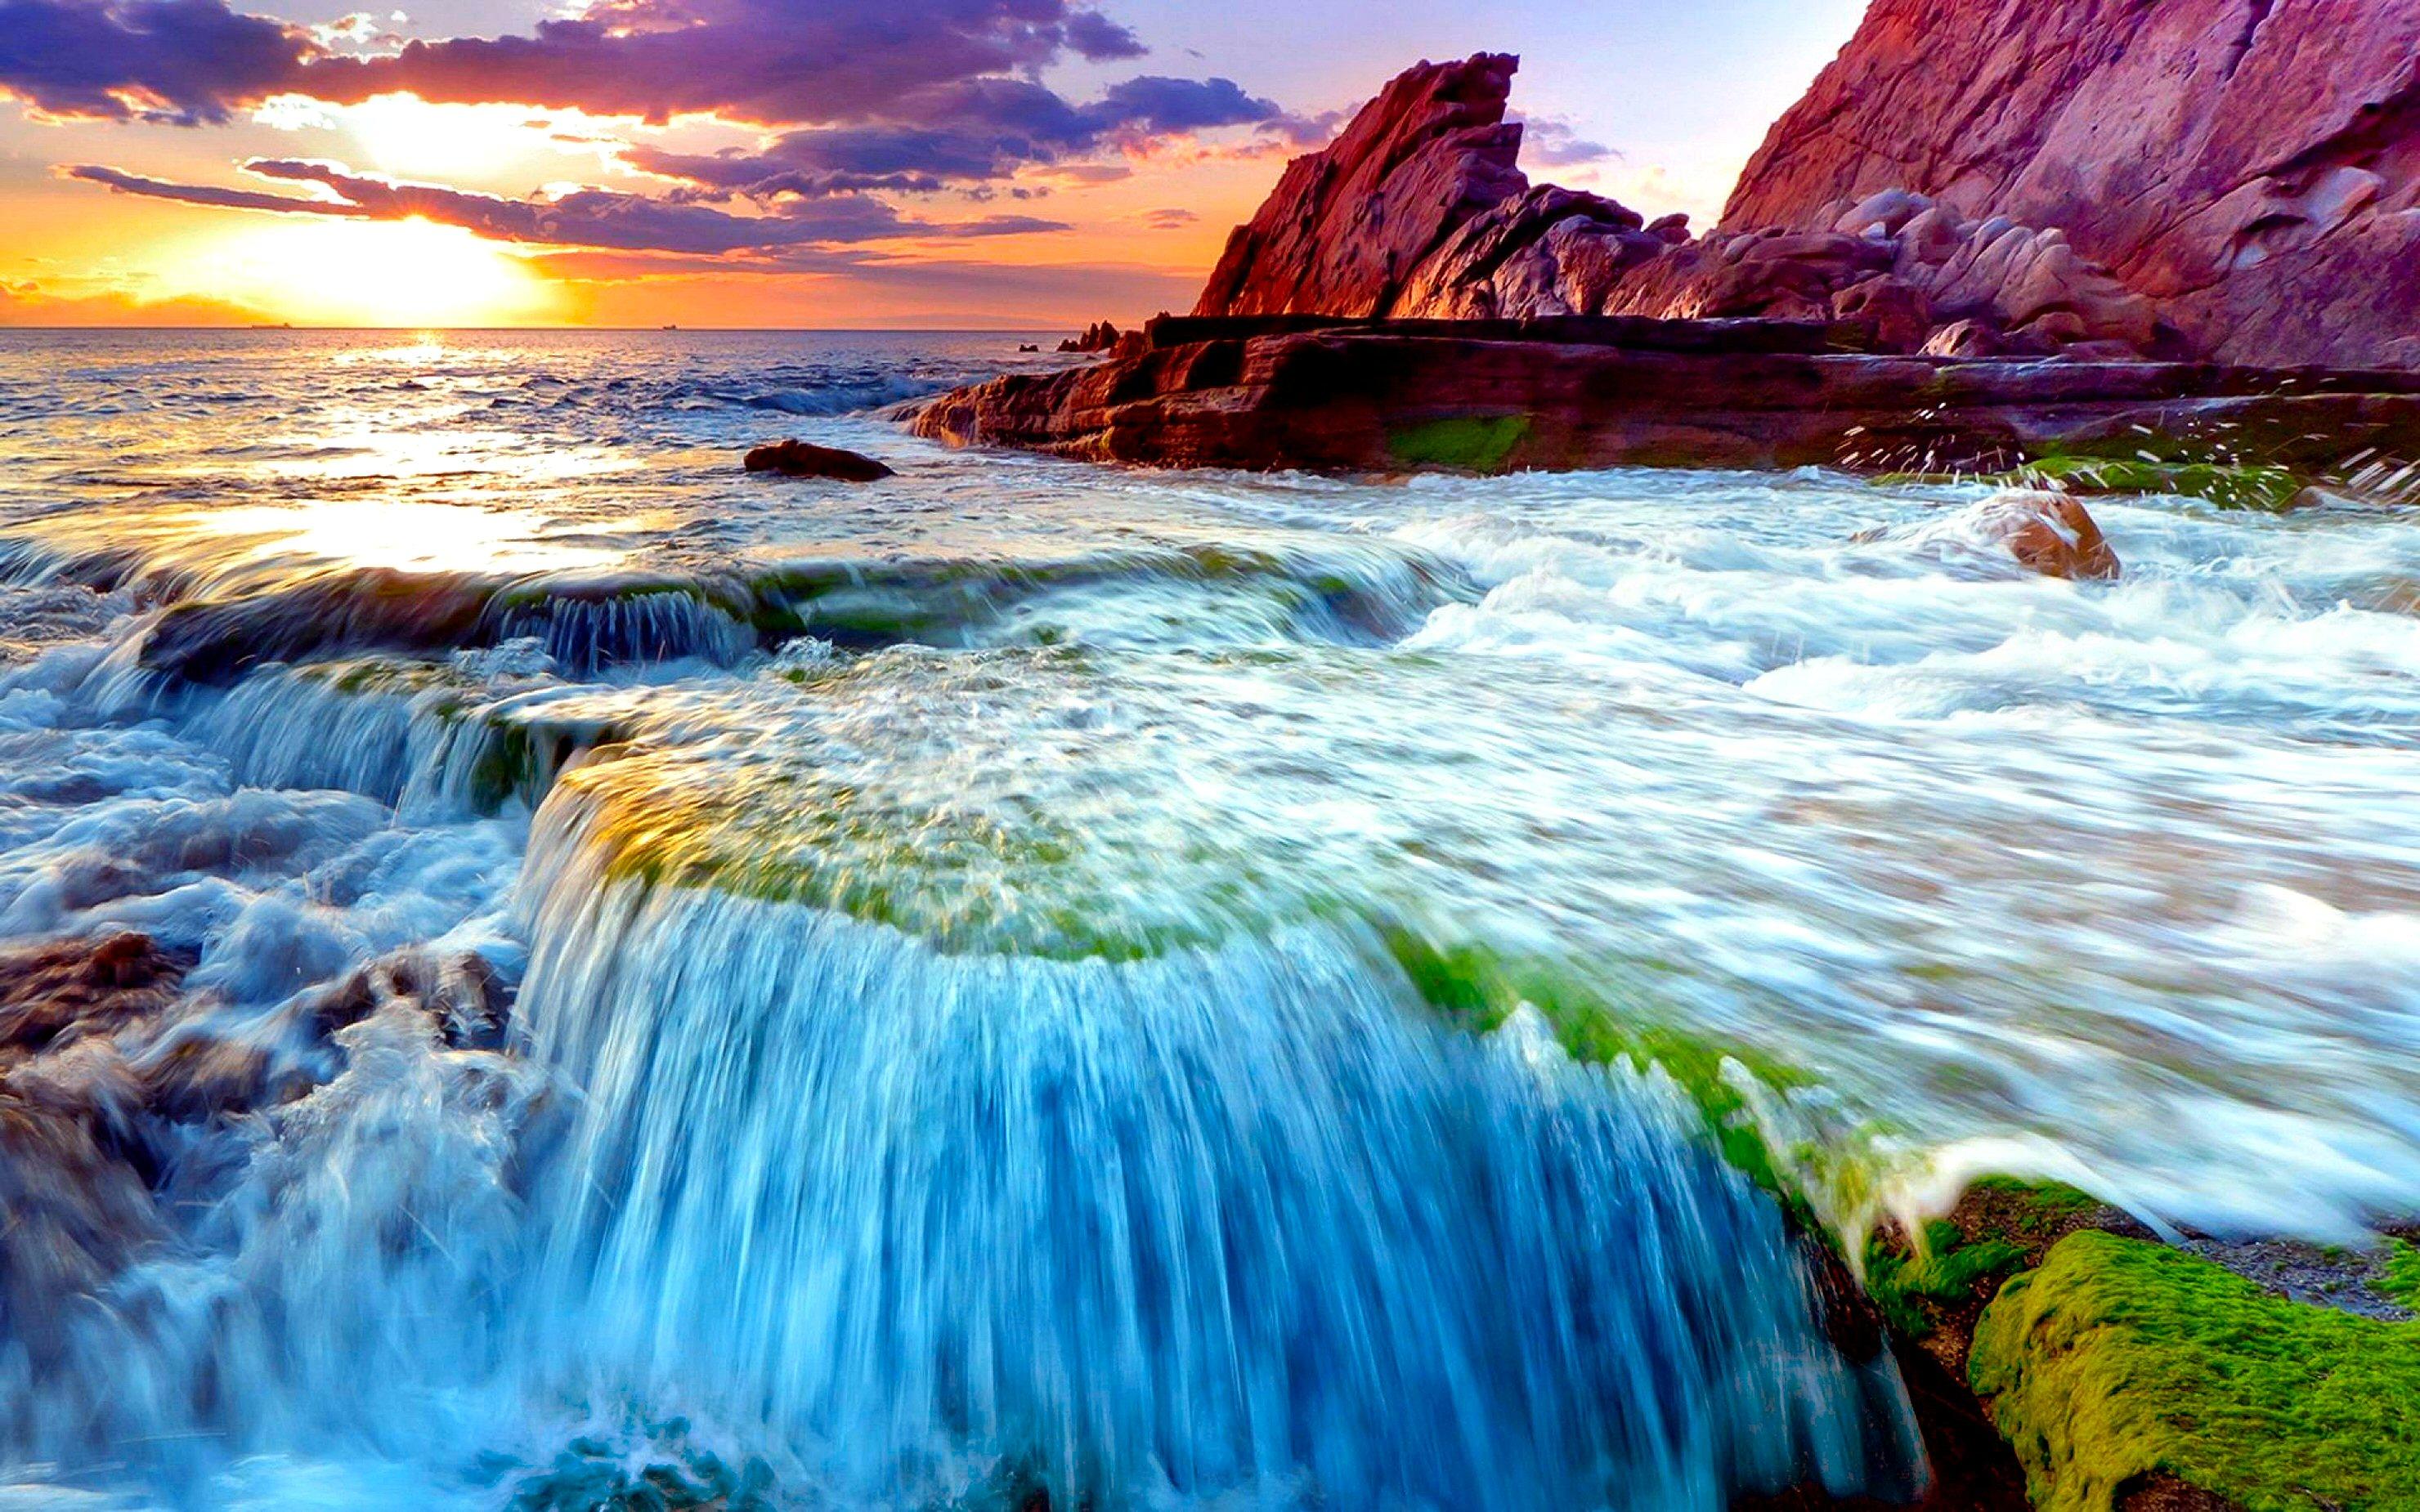 Nature Windows 10 Background - HD Wallpaper